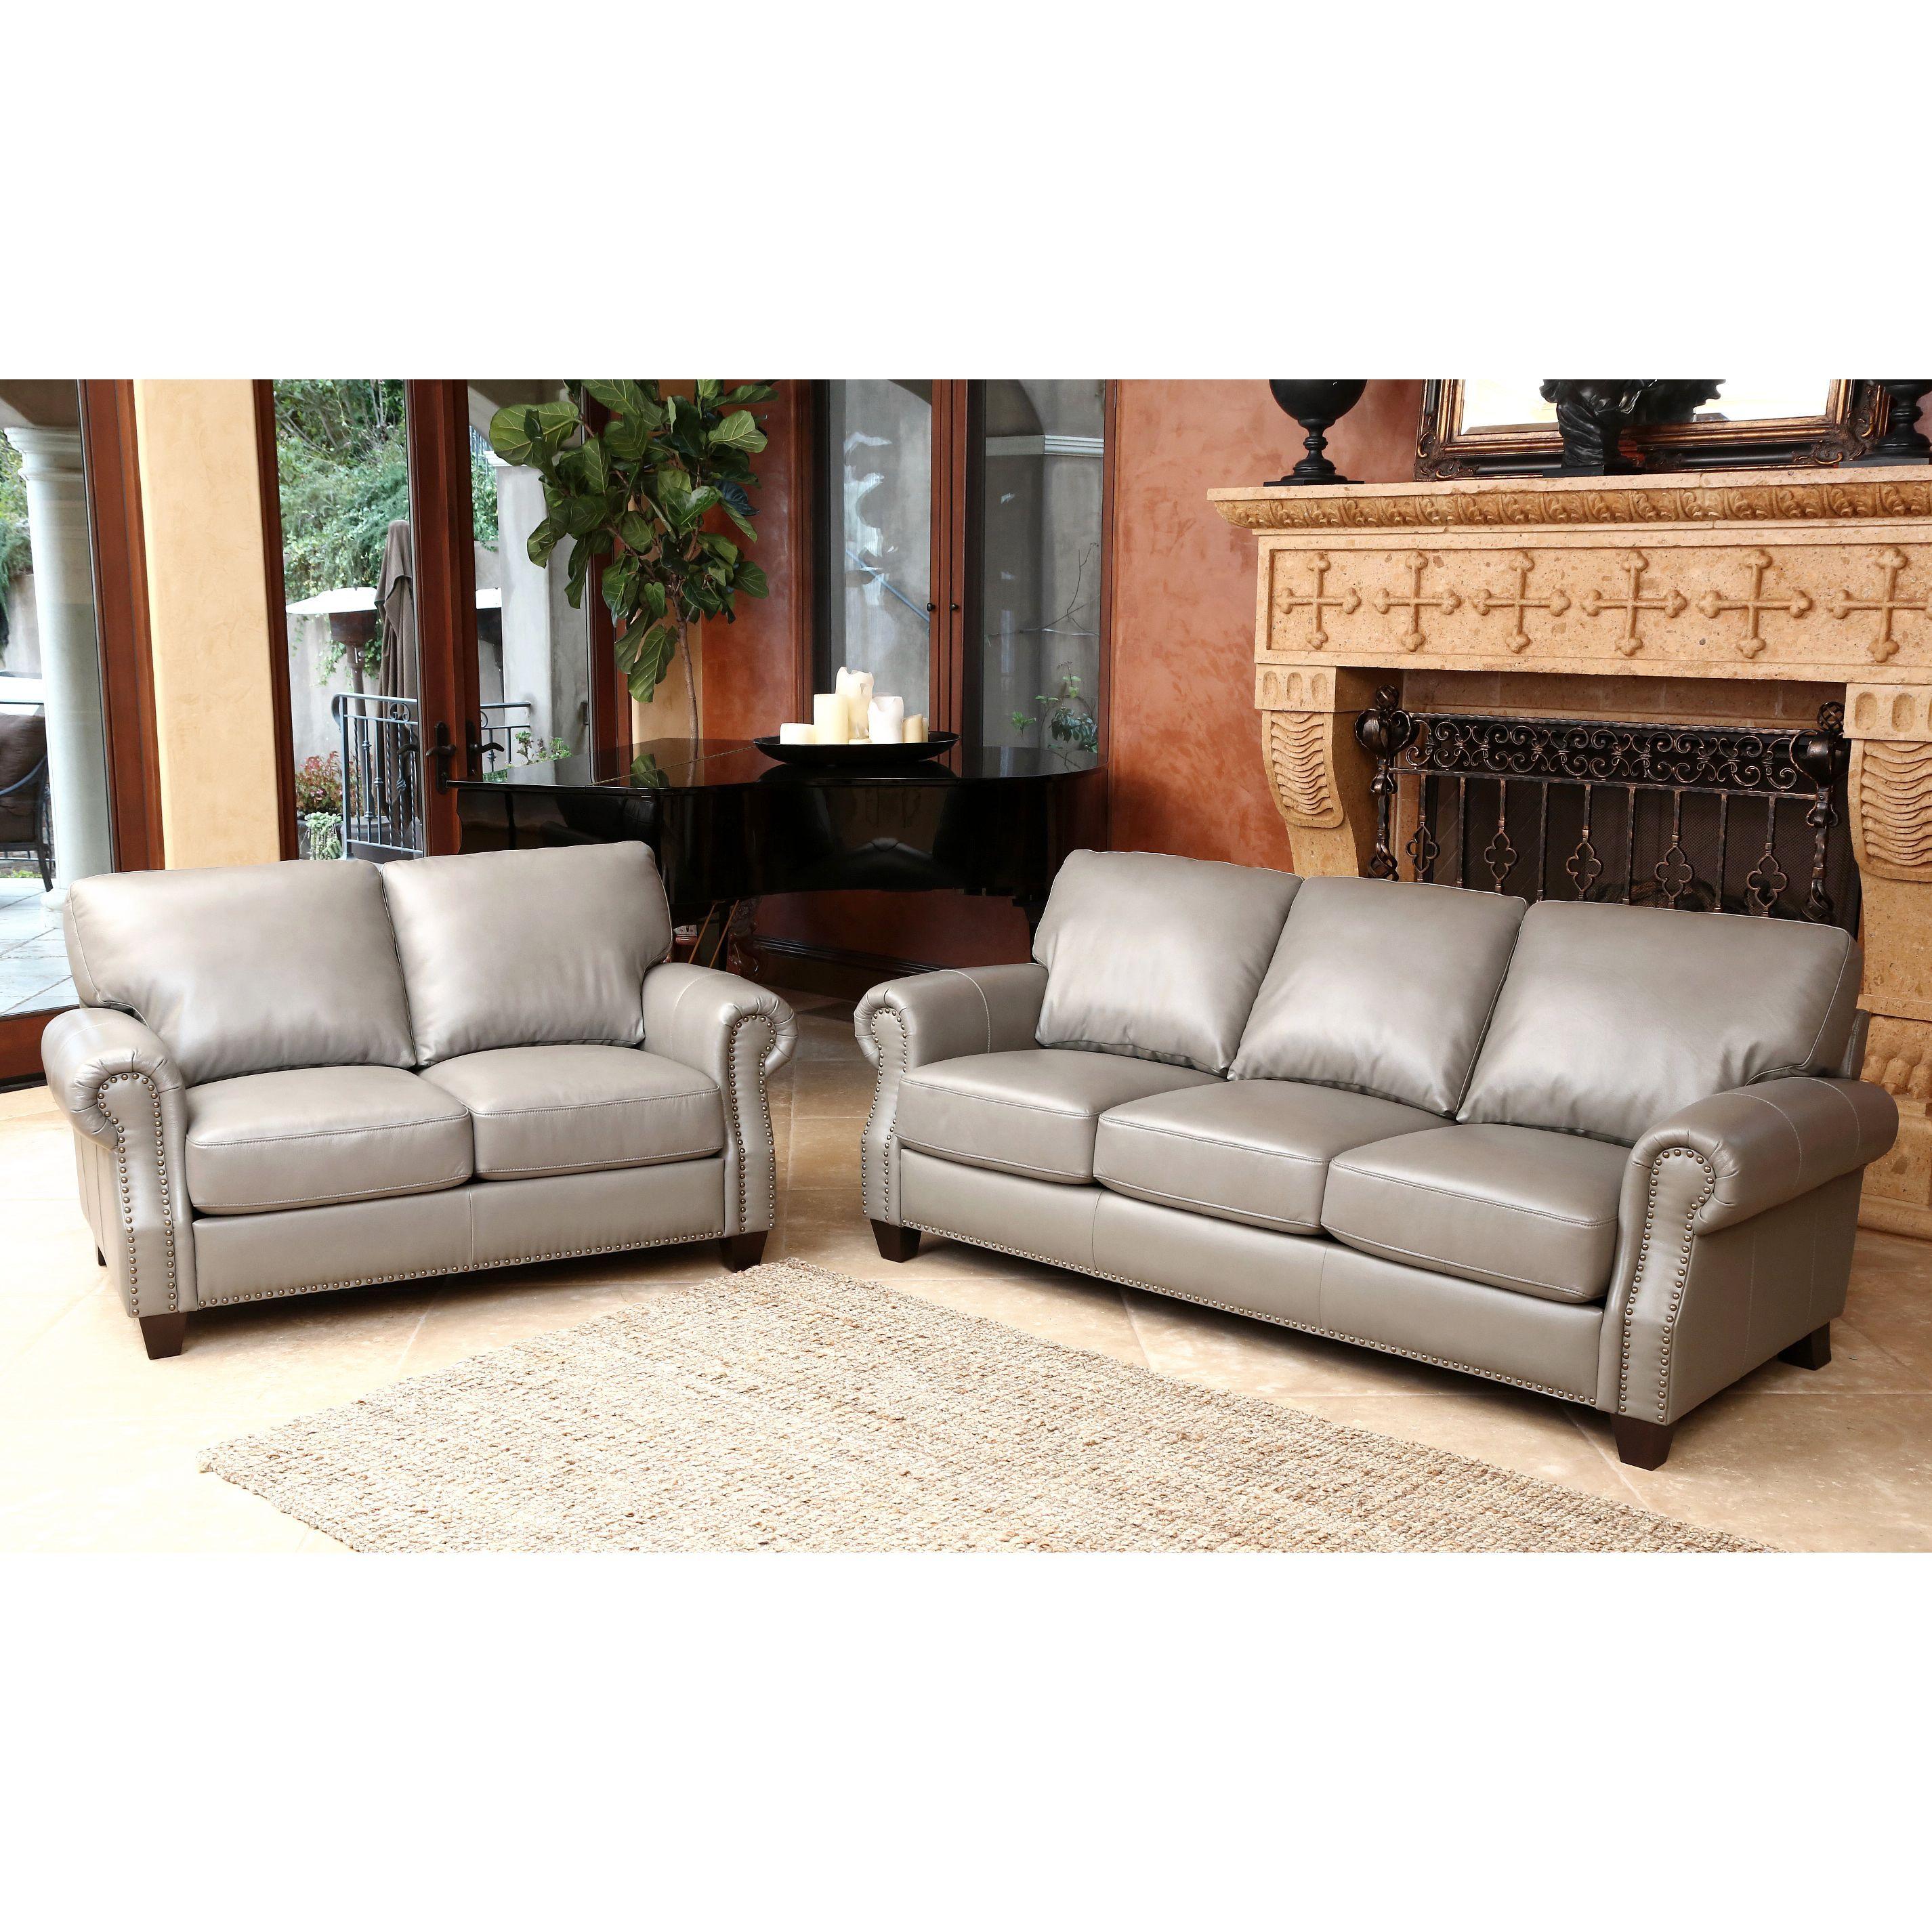 Abbyson Landon Top Grain Leather Sofa and Loveseat by Abbyson